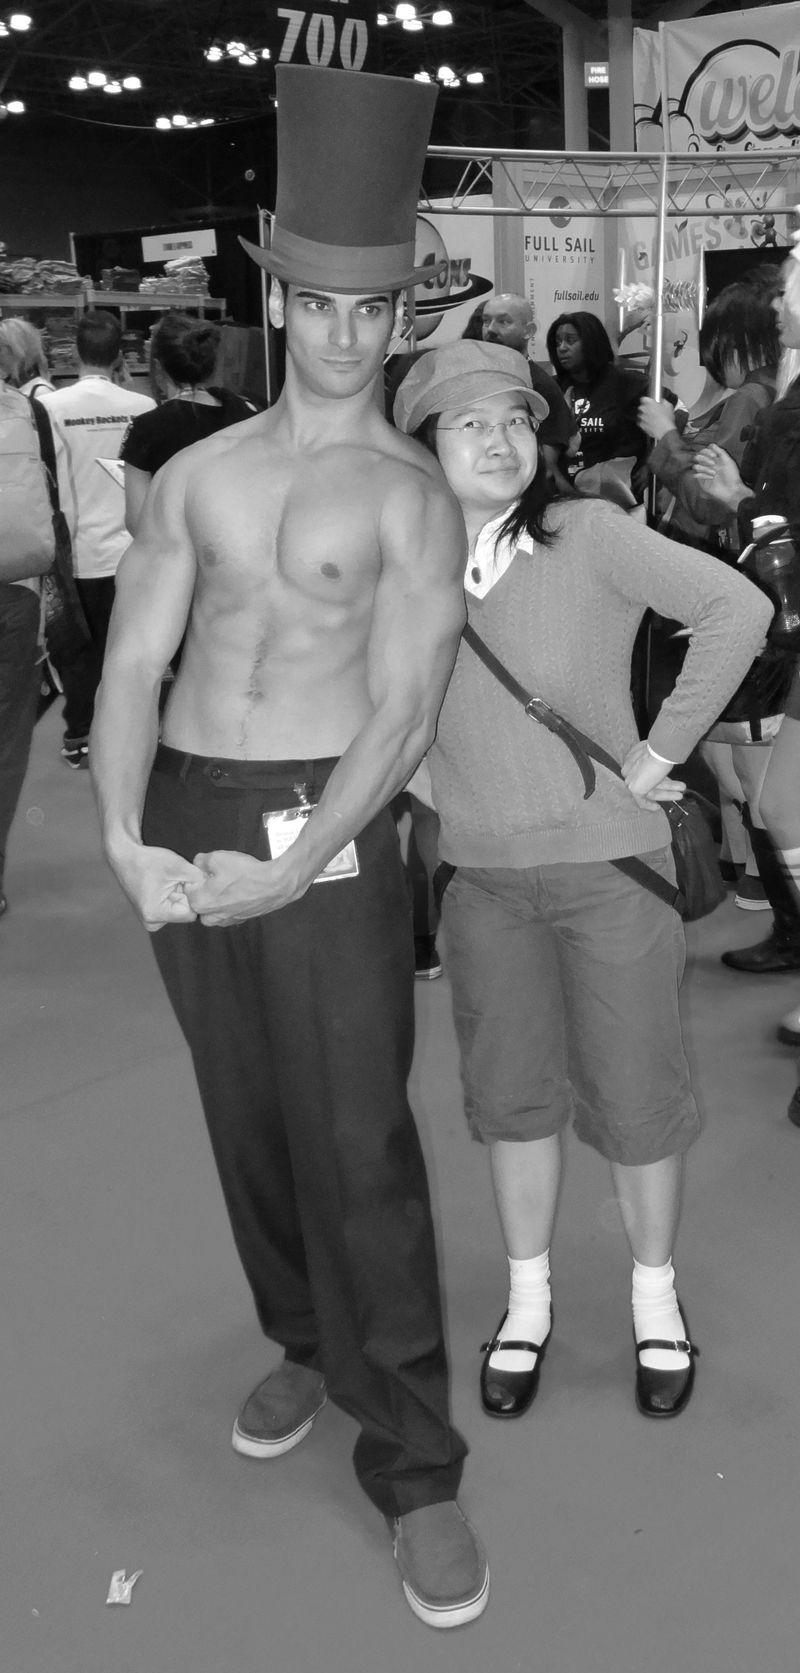 Comic Con shirtless hottie again